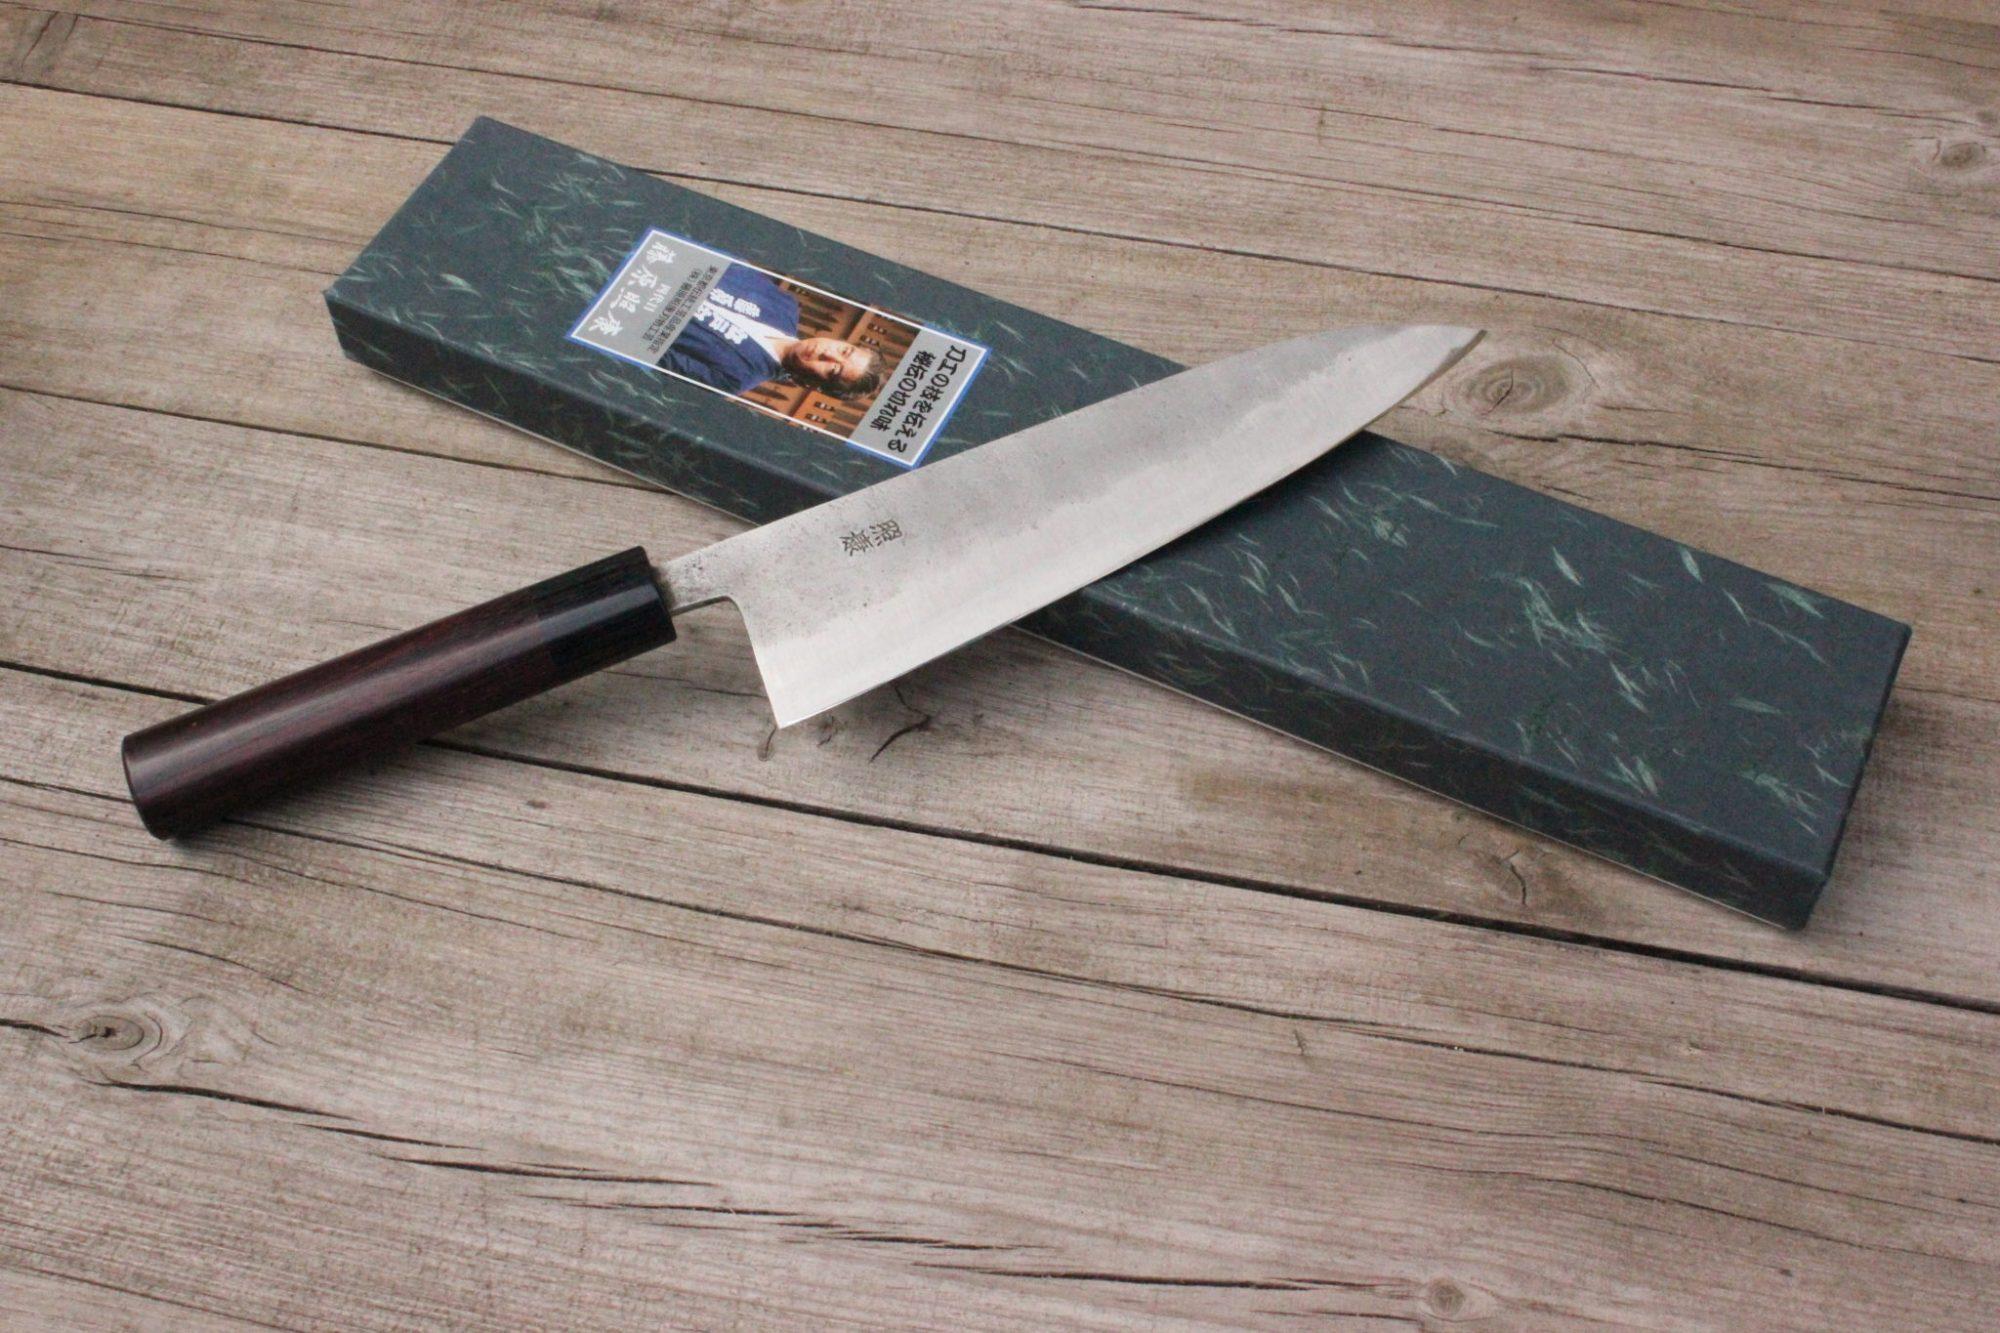 gyuto handmade japanese kitchen knives u0026 tools